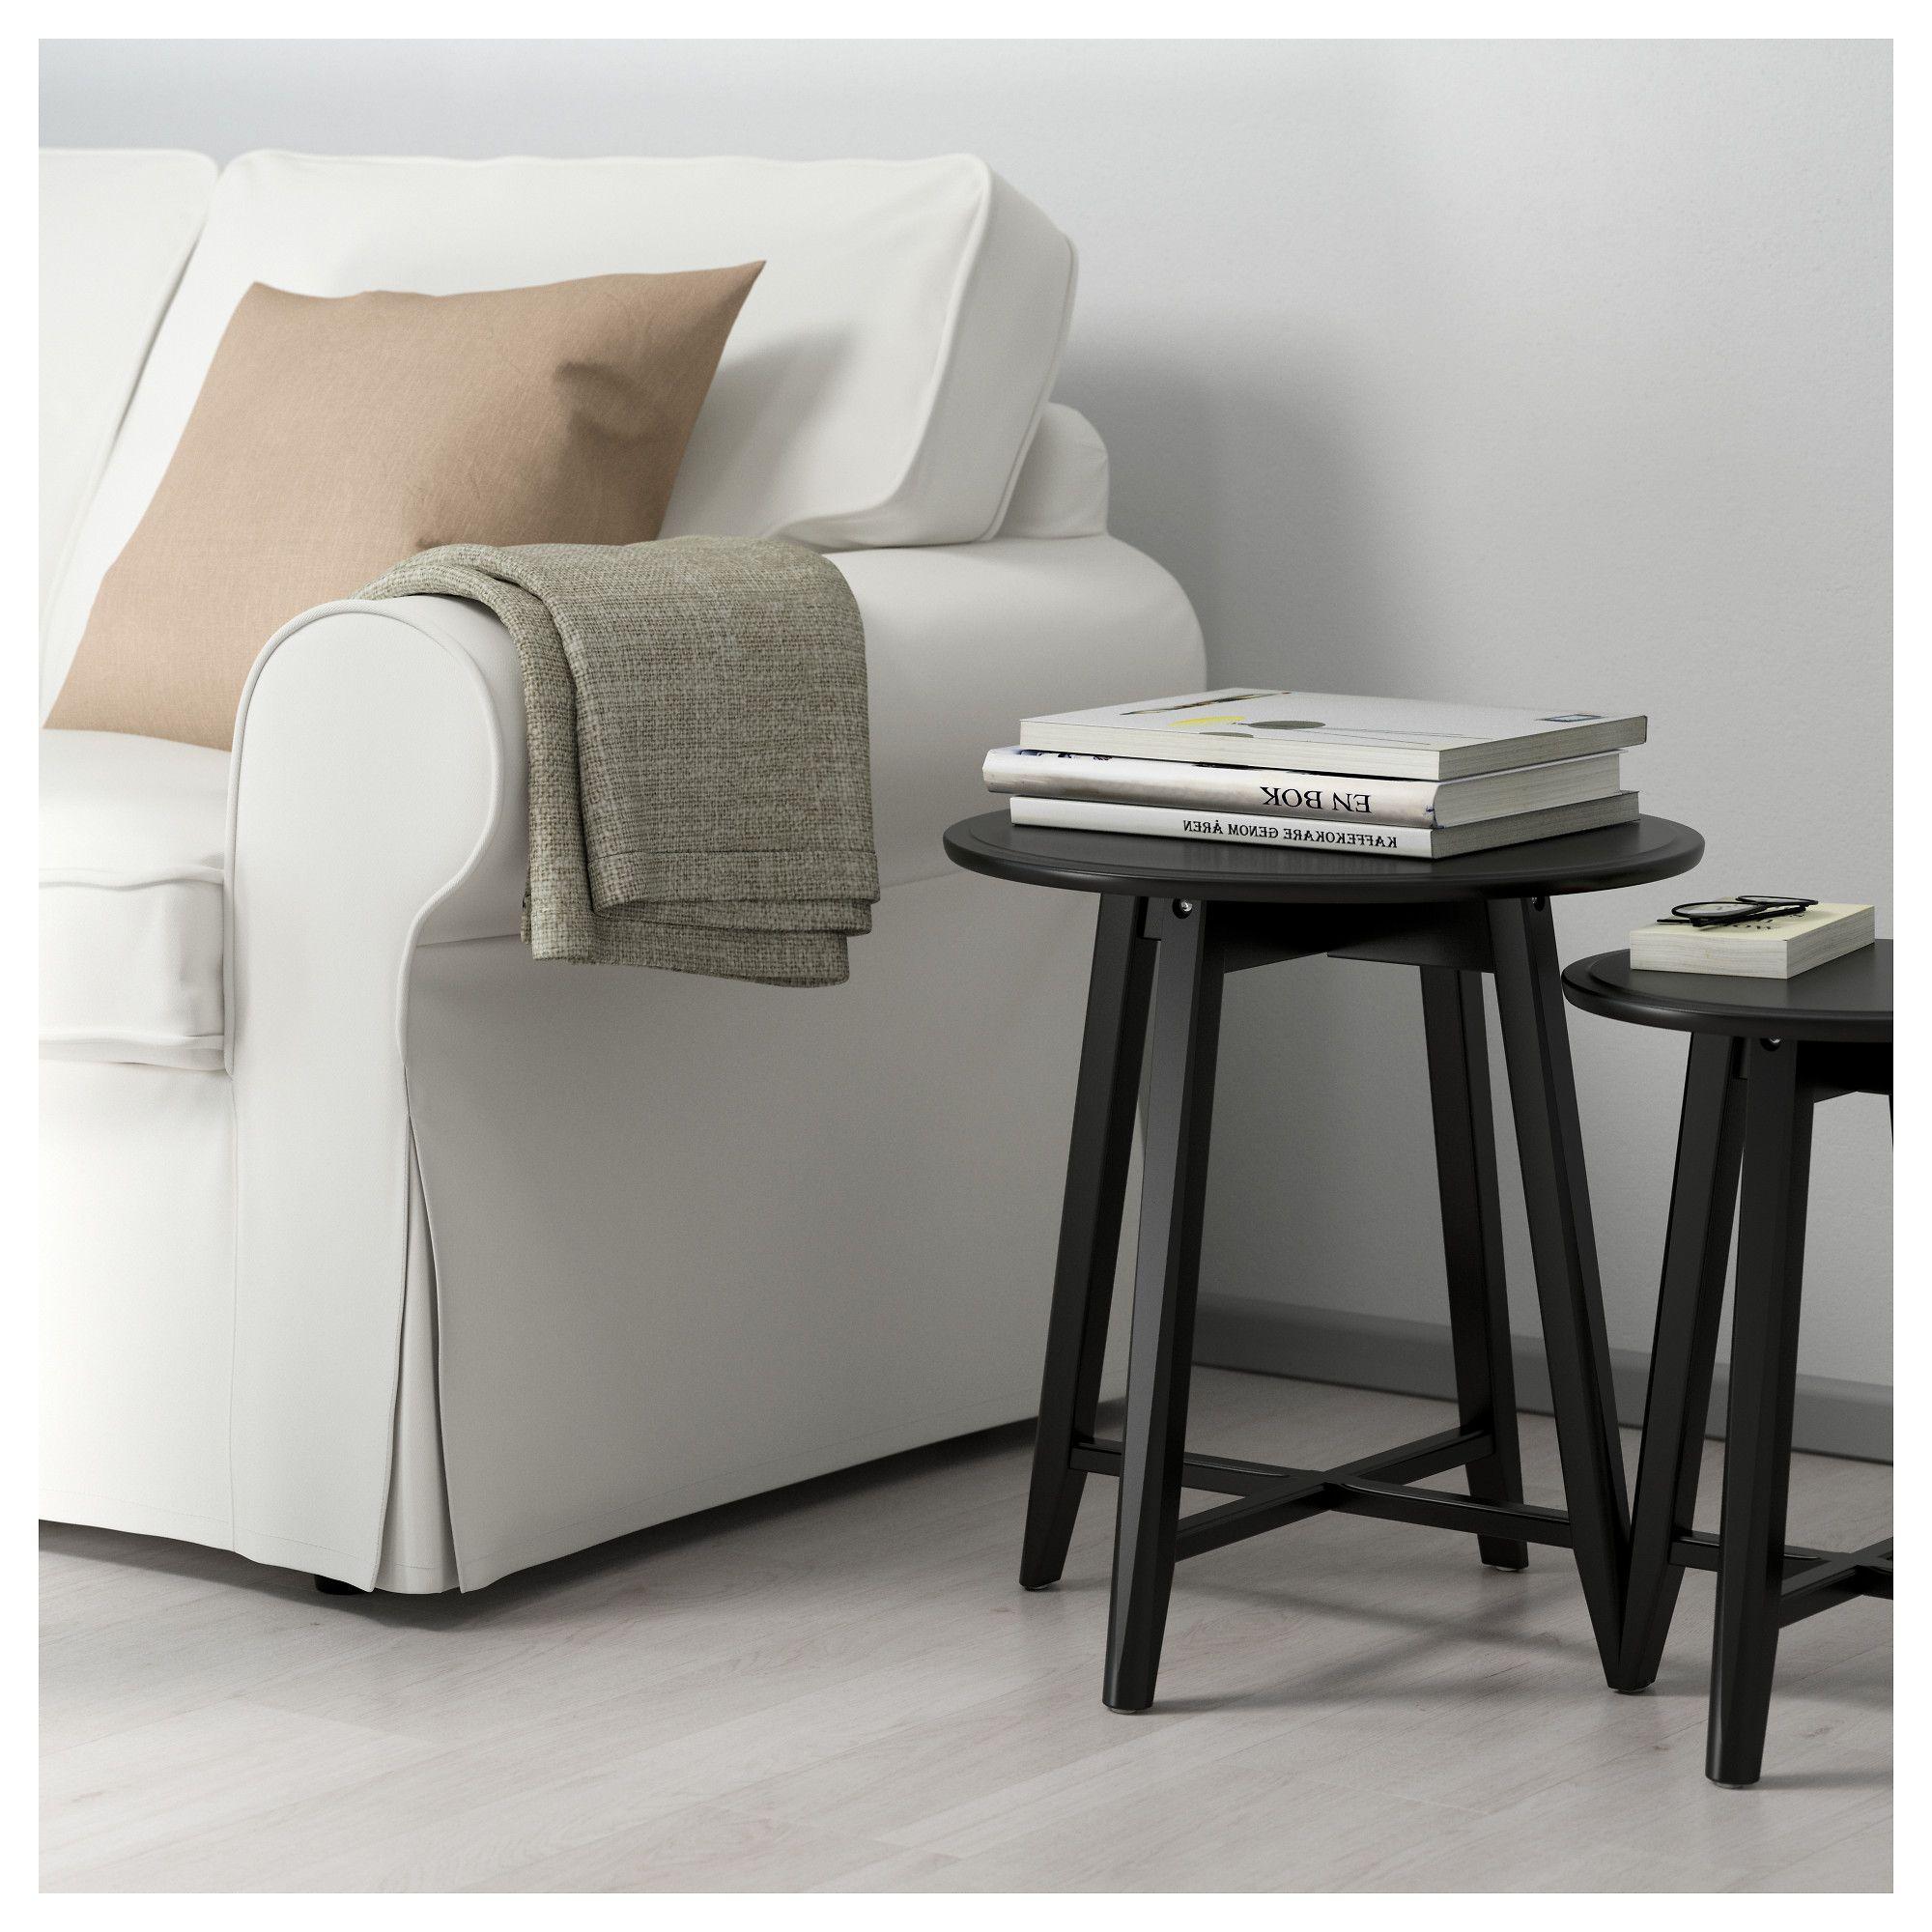 Kragsta Nesting Tables Set Of 2 Black Nesting Tables Coffee Table Ikea